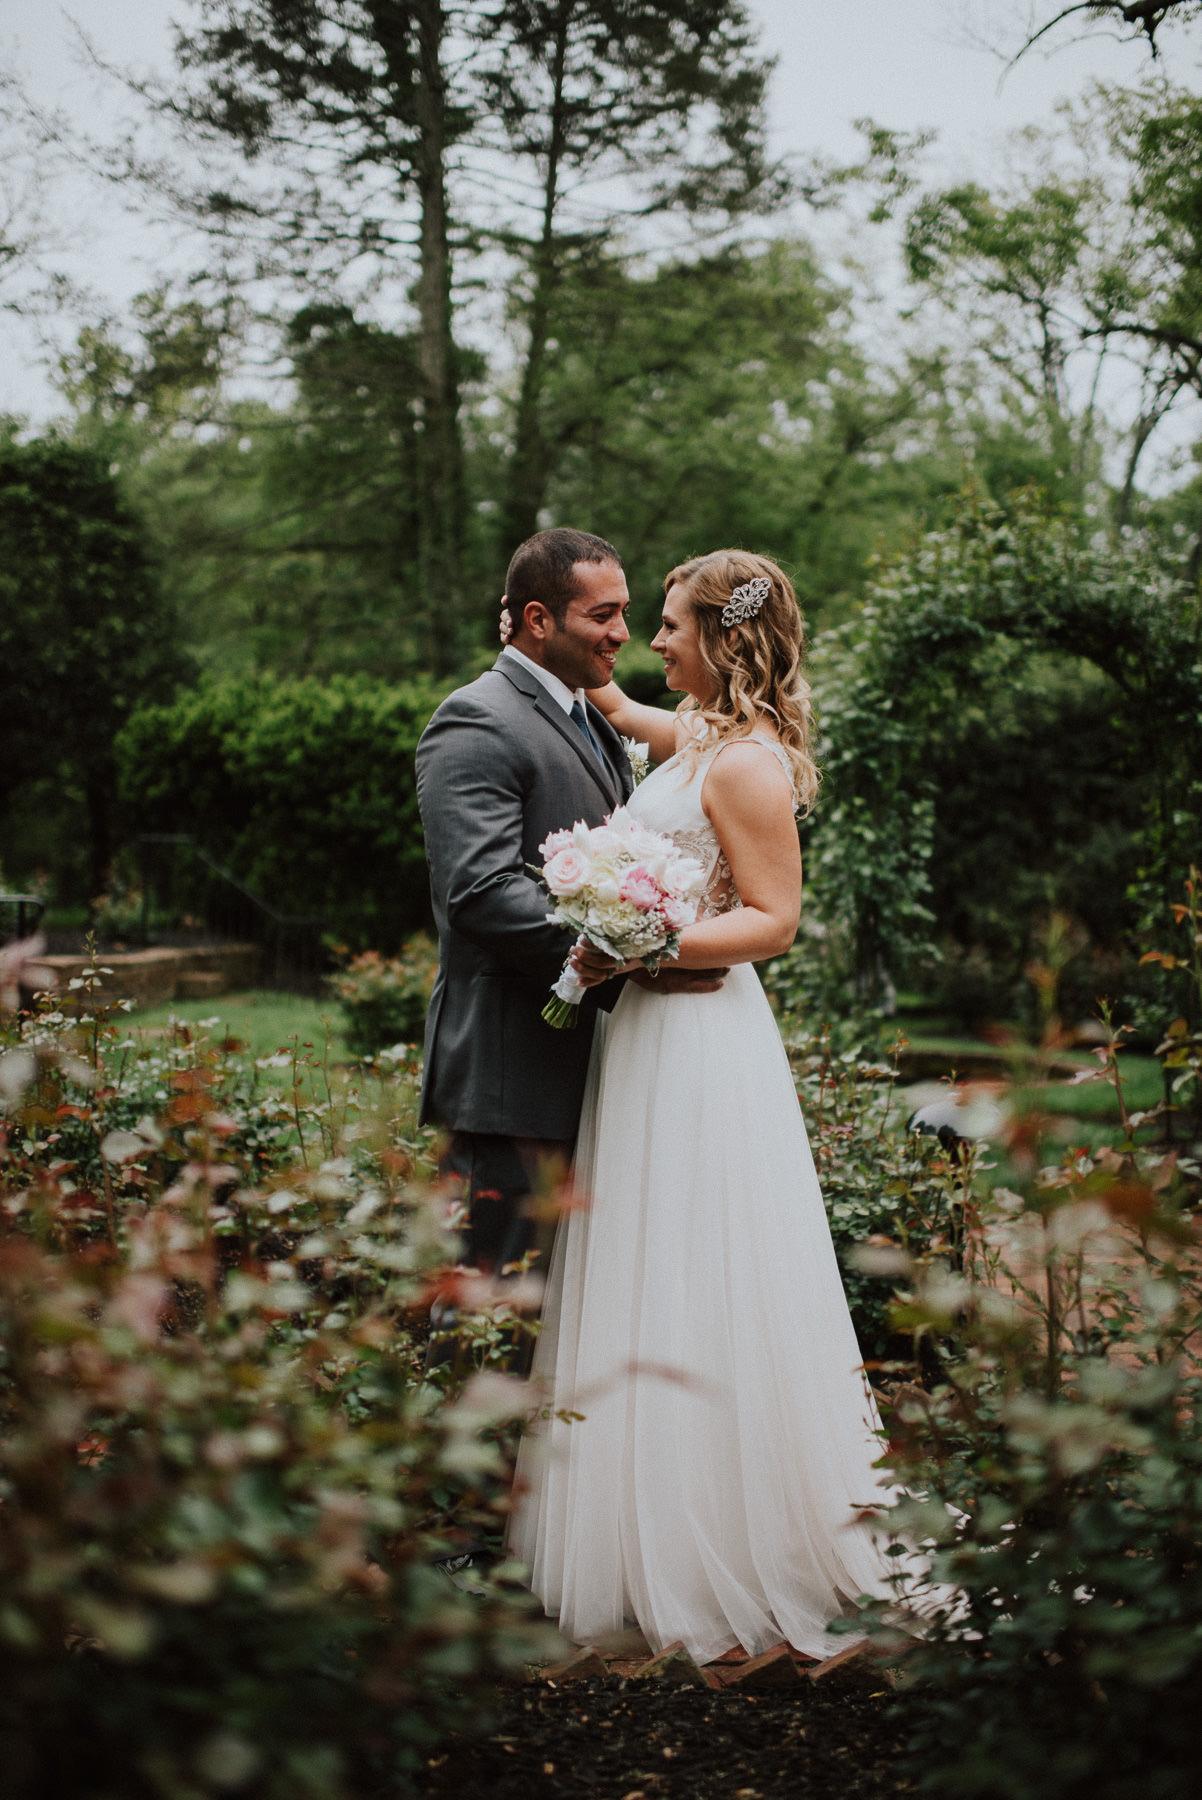 appleford-estate-wedding-photography-32.jpg